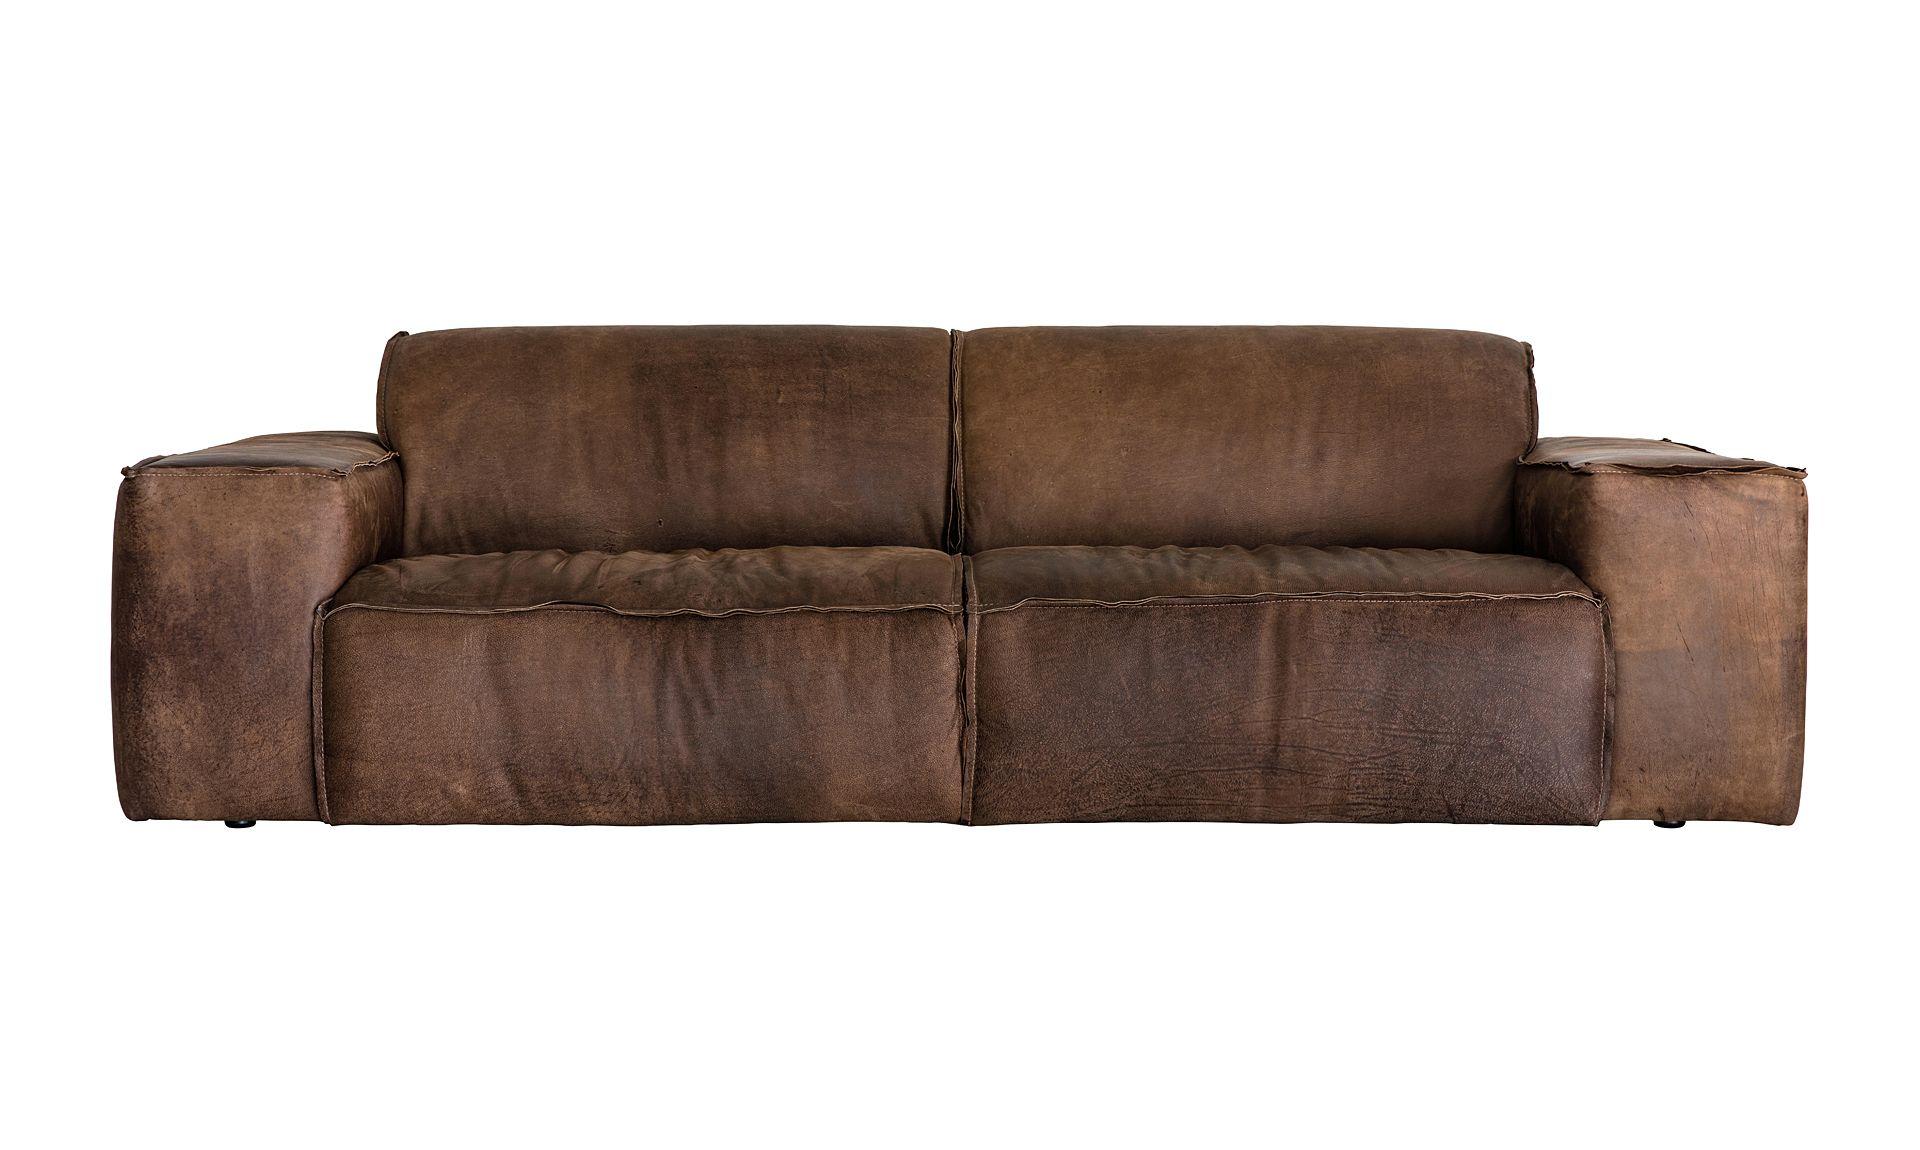 Marconi Sofa For Sale Weylandts South Africa Sofa Sale Weylandts Leather Sofa